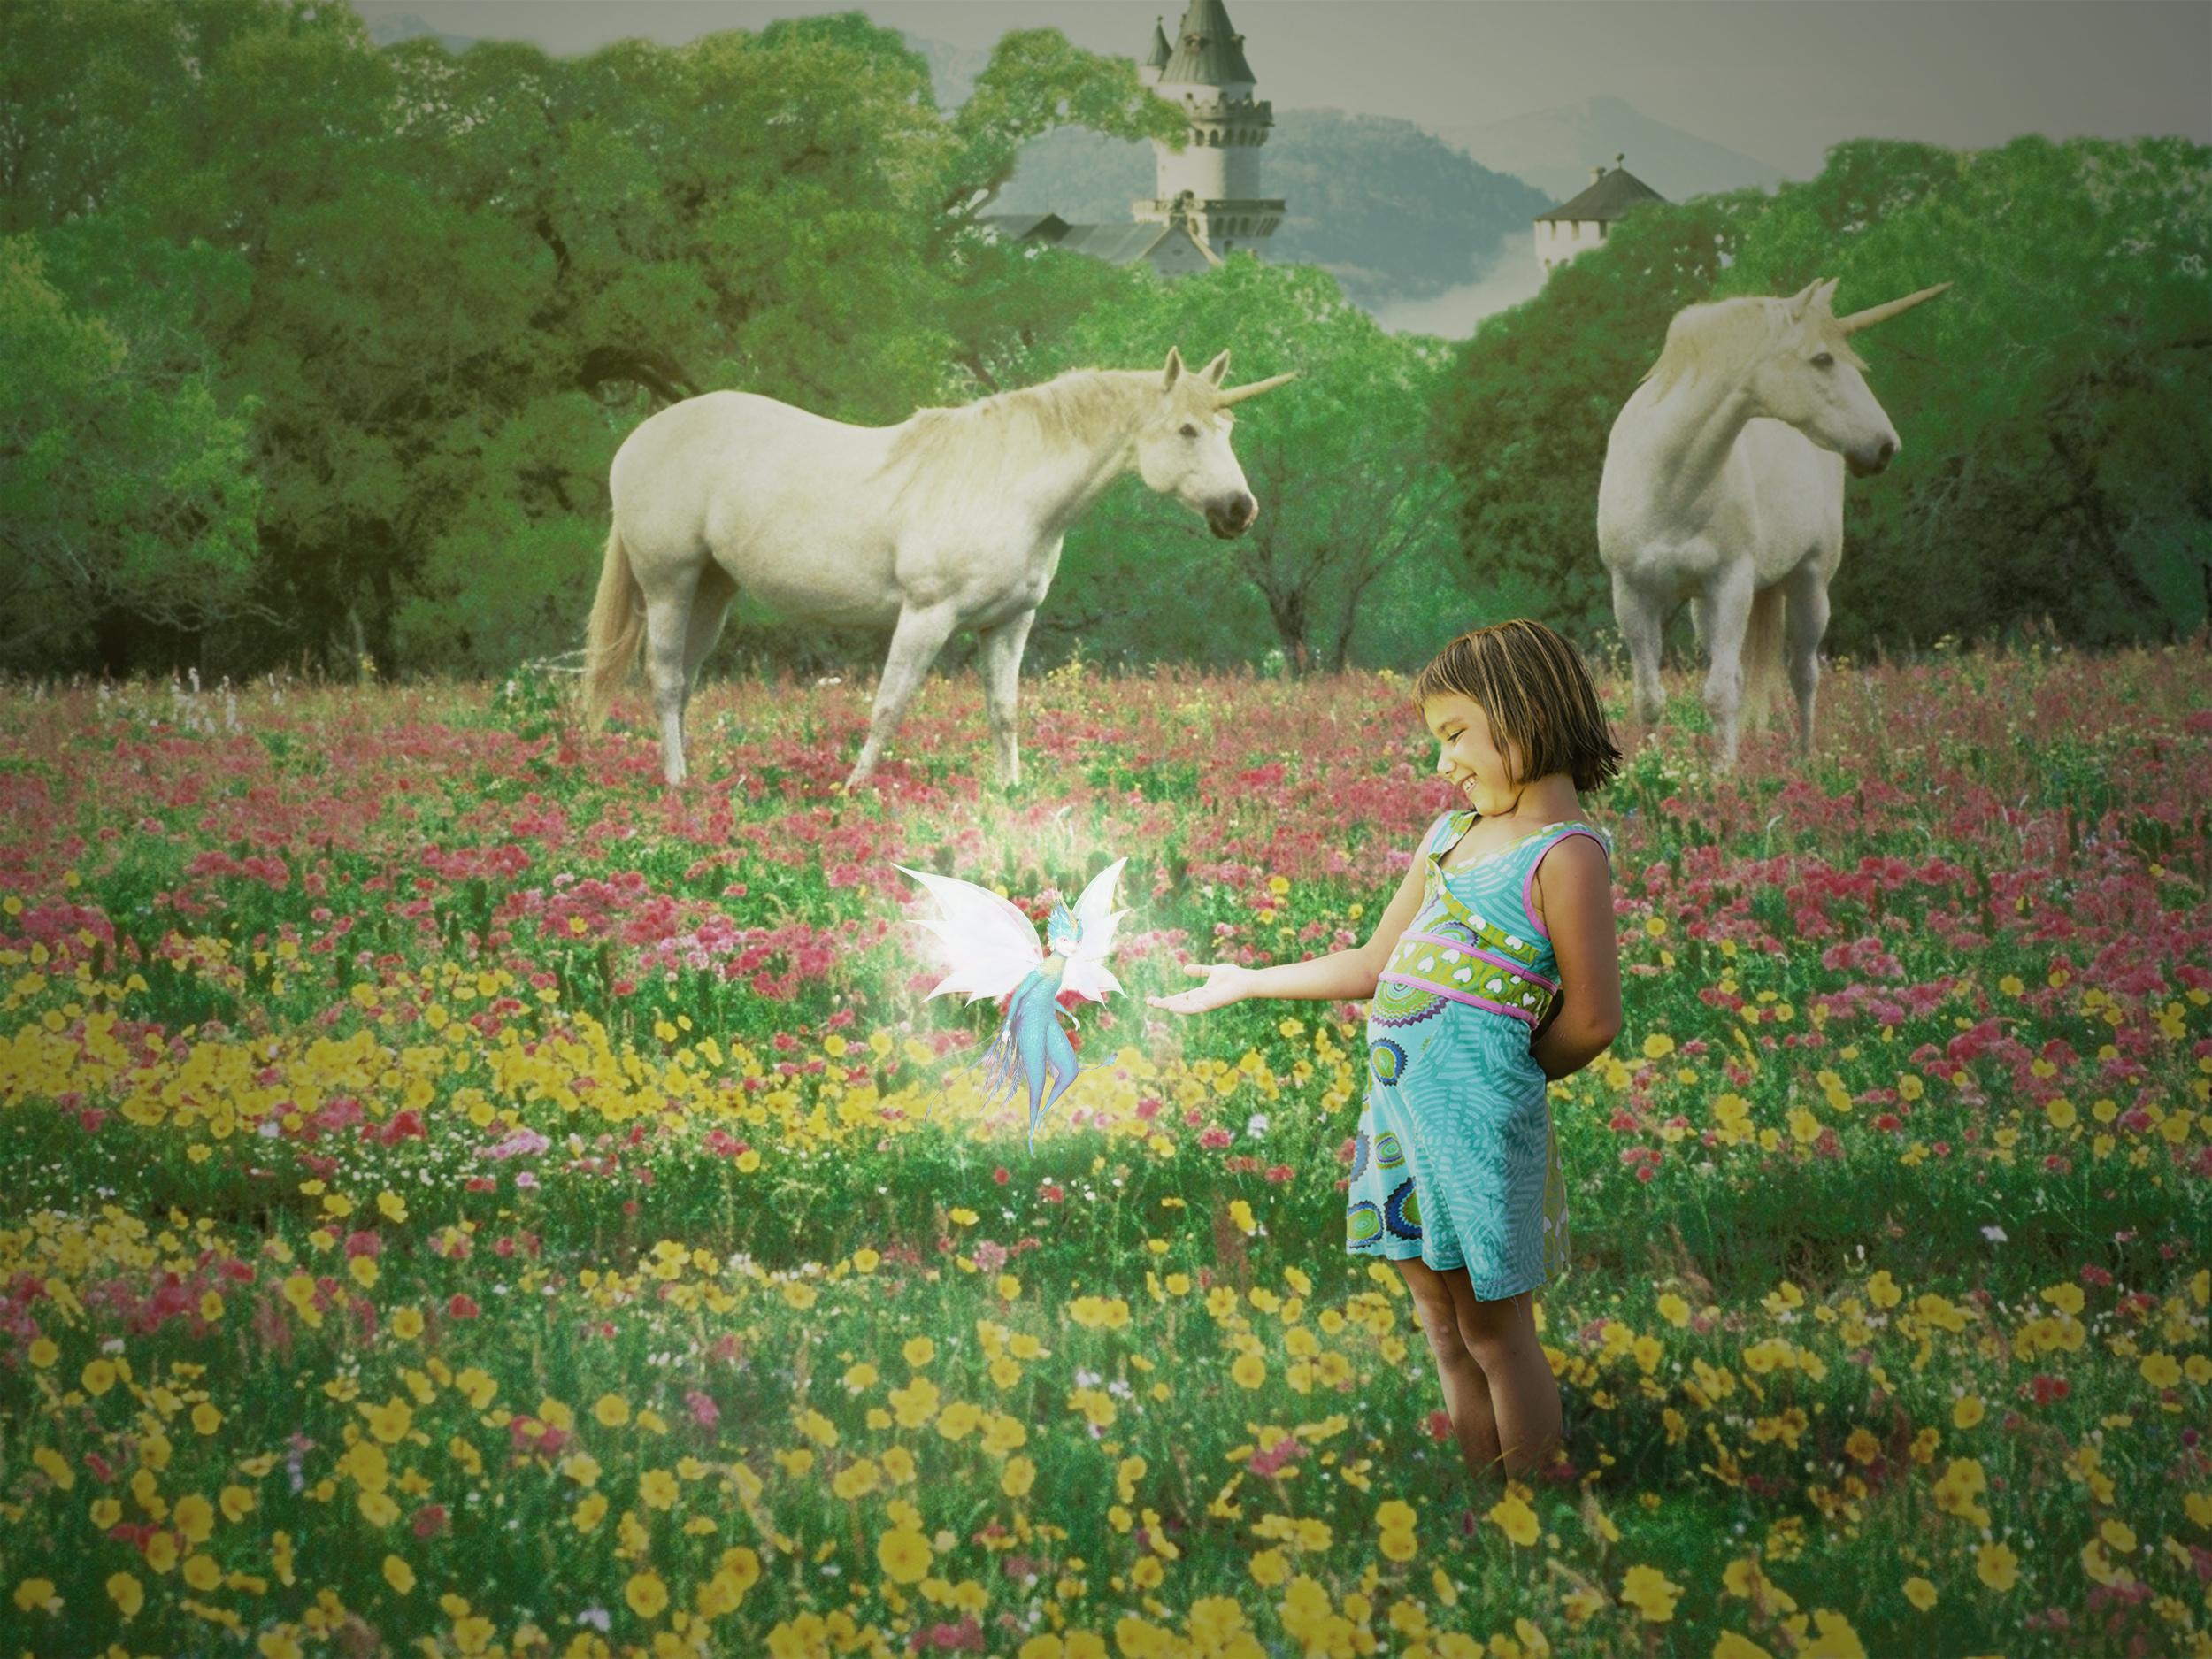 campanilla unicorns i Judit.jpg